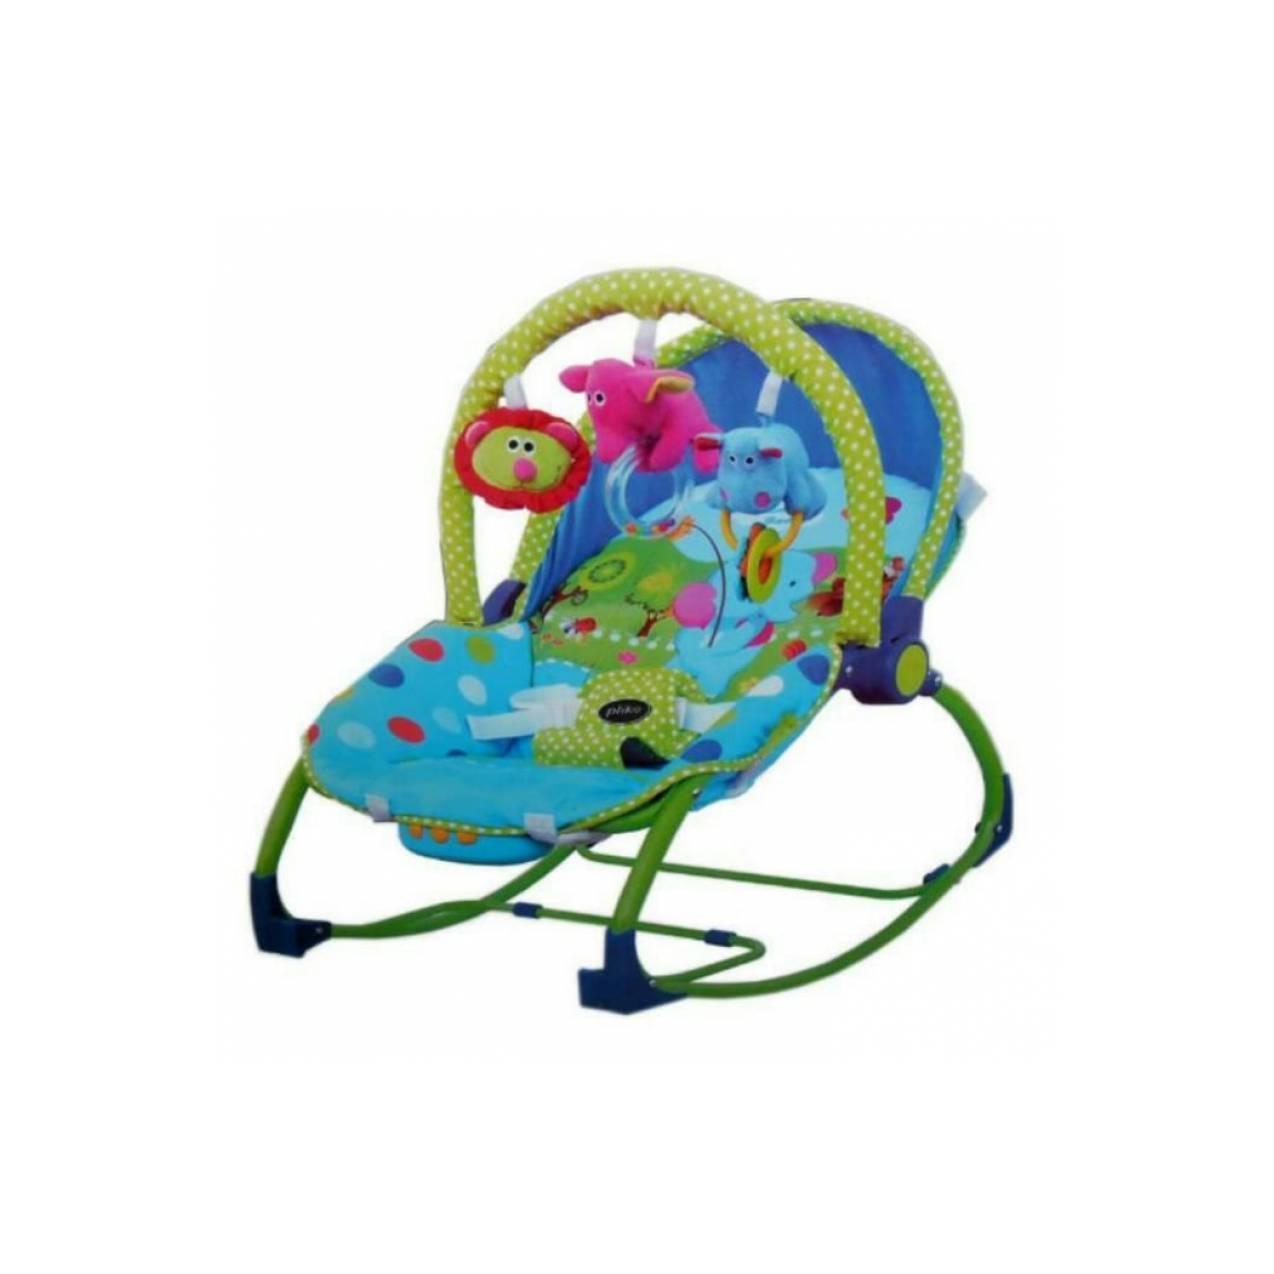 BOUNCER BABY ROCKING CHAIR PLIKO HAMMOCK 3 PHASE ELEPHANT